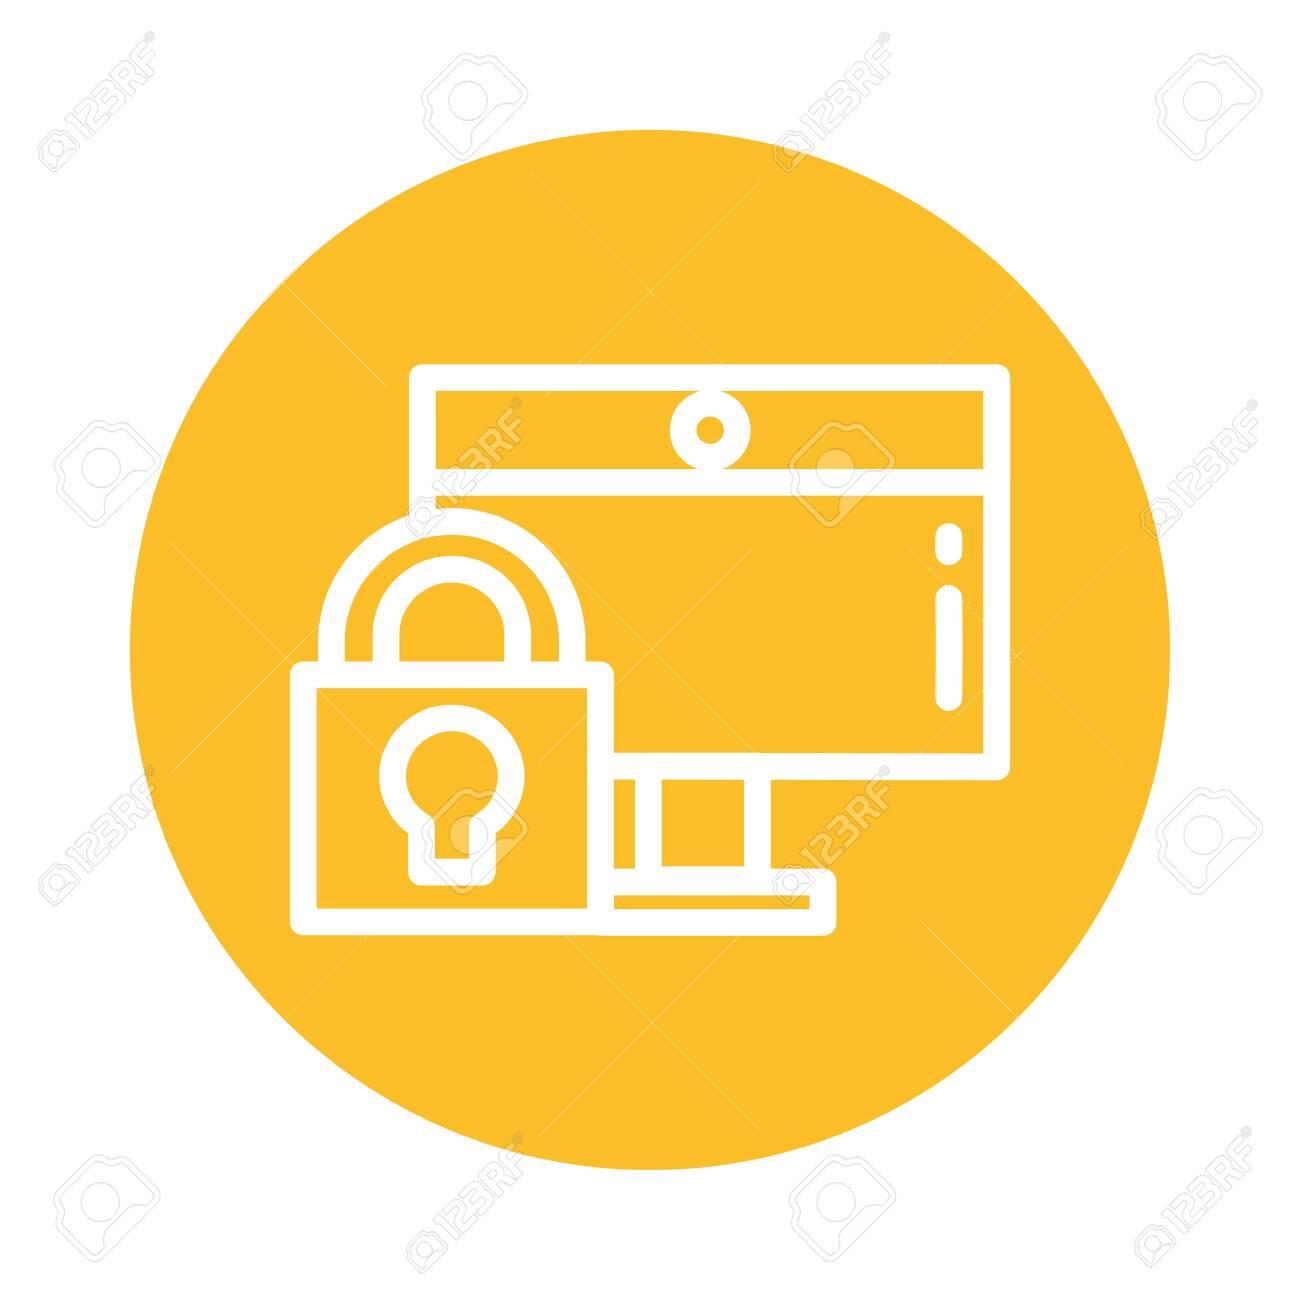 padlocked screen, block and flat style icon vector illustration design - 153917653